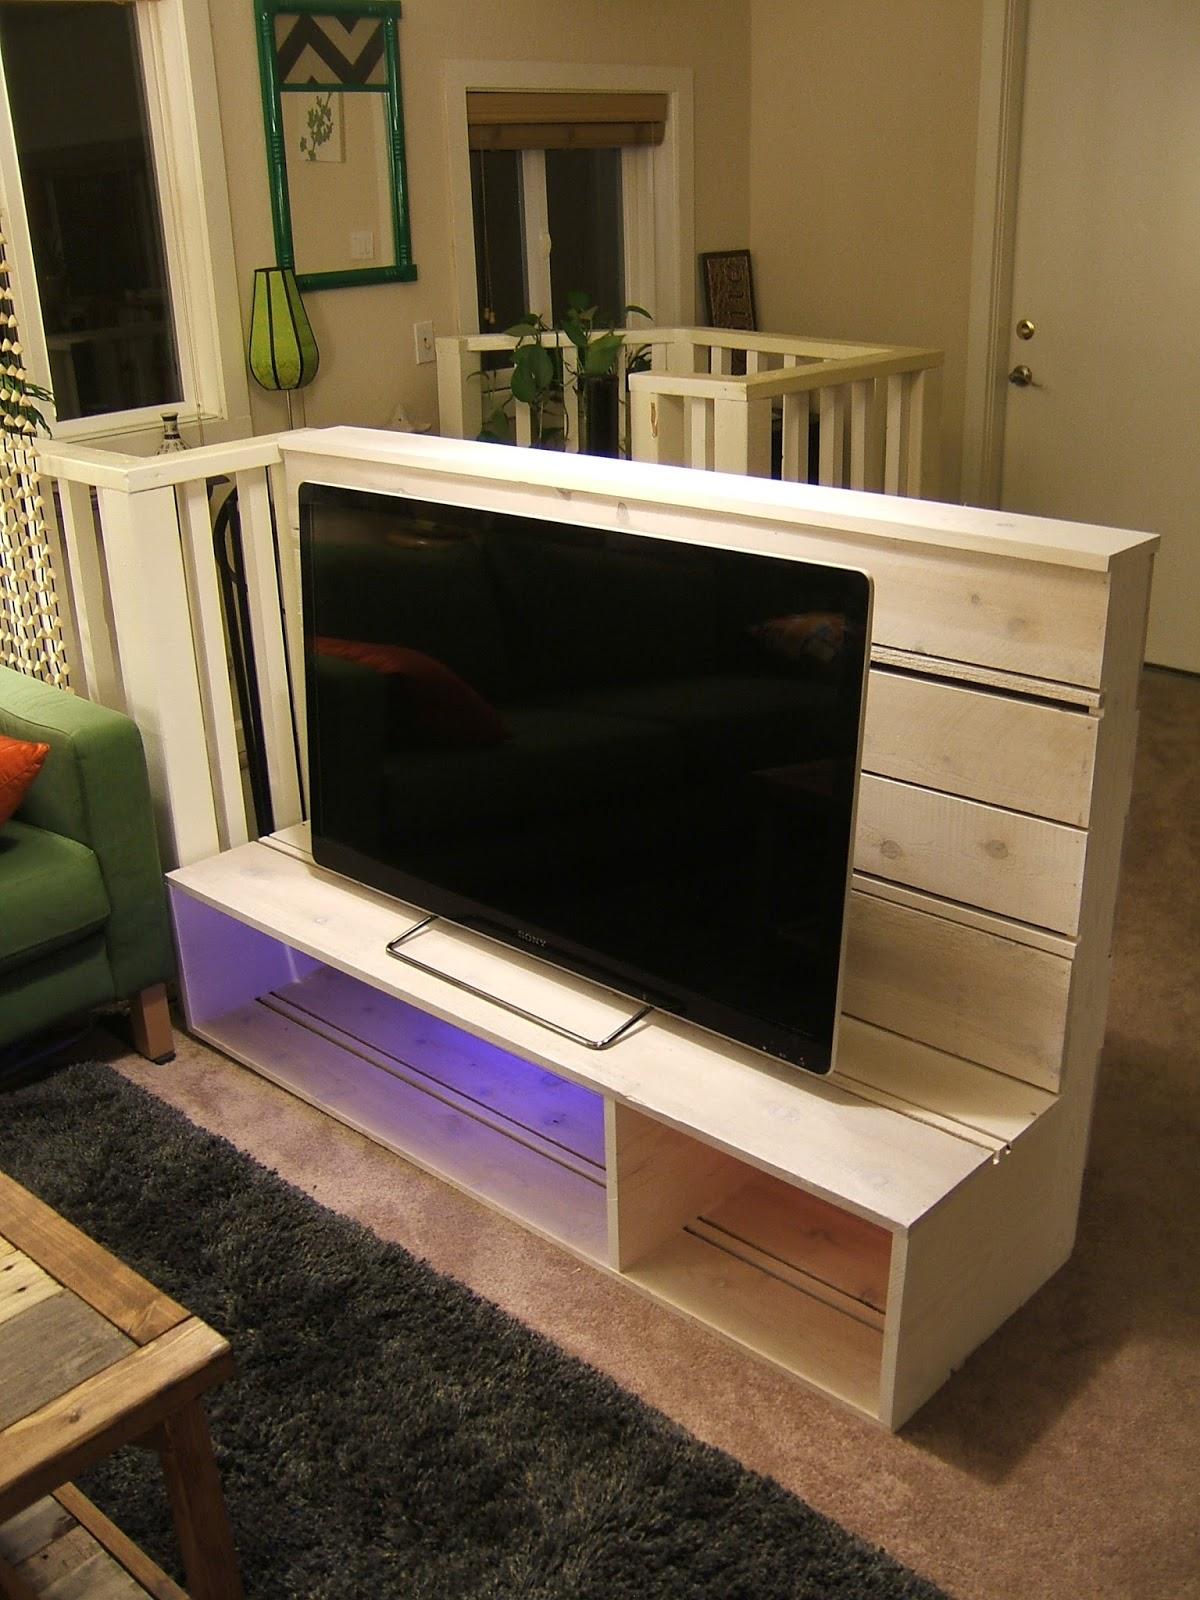 floors hello movie theater haha ok some night time light. Black Bedroom Furniture Sets. Home Design Ideas